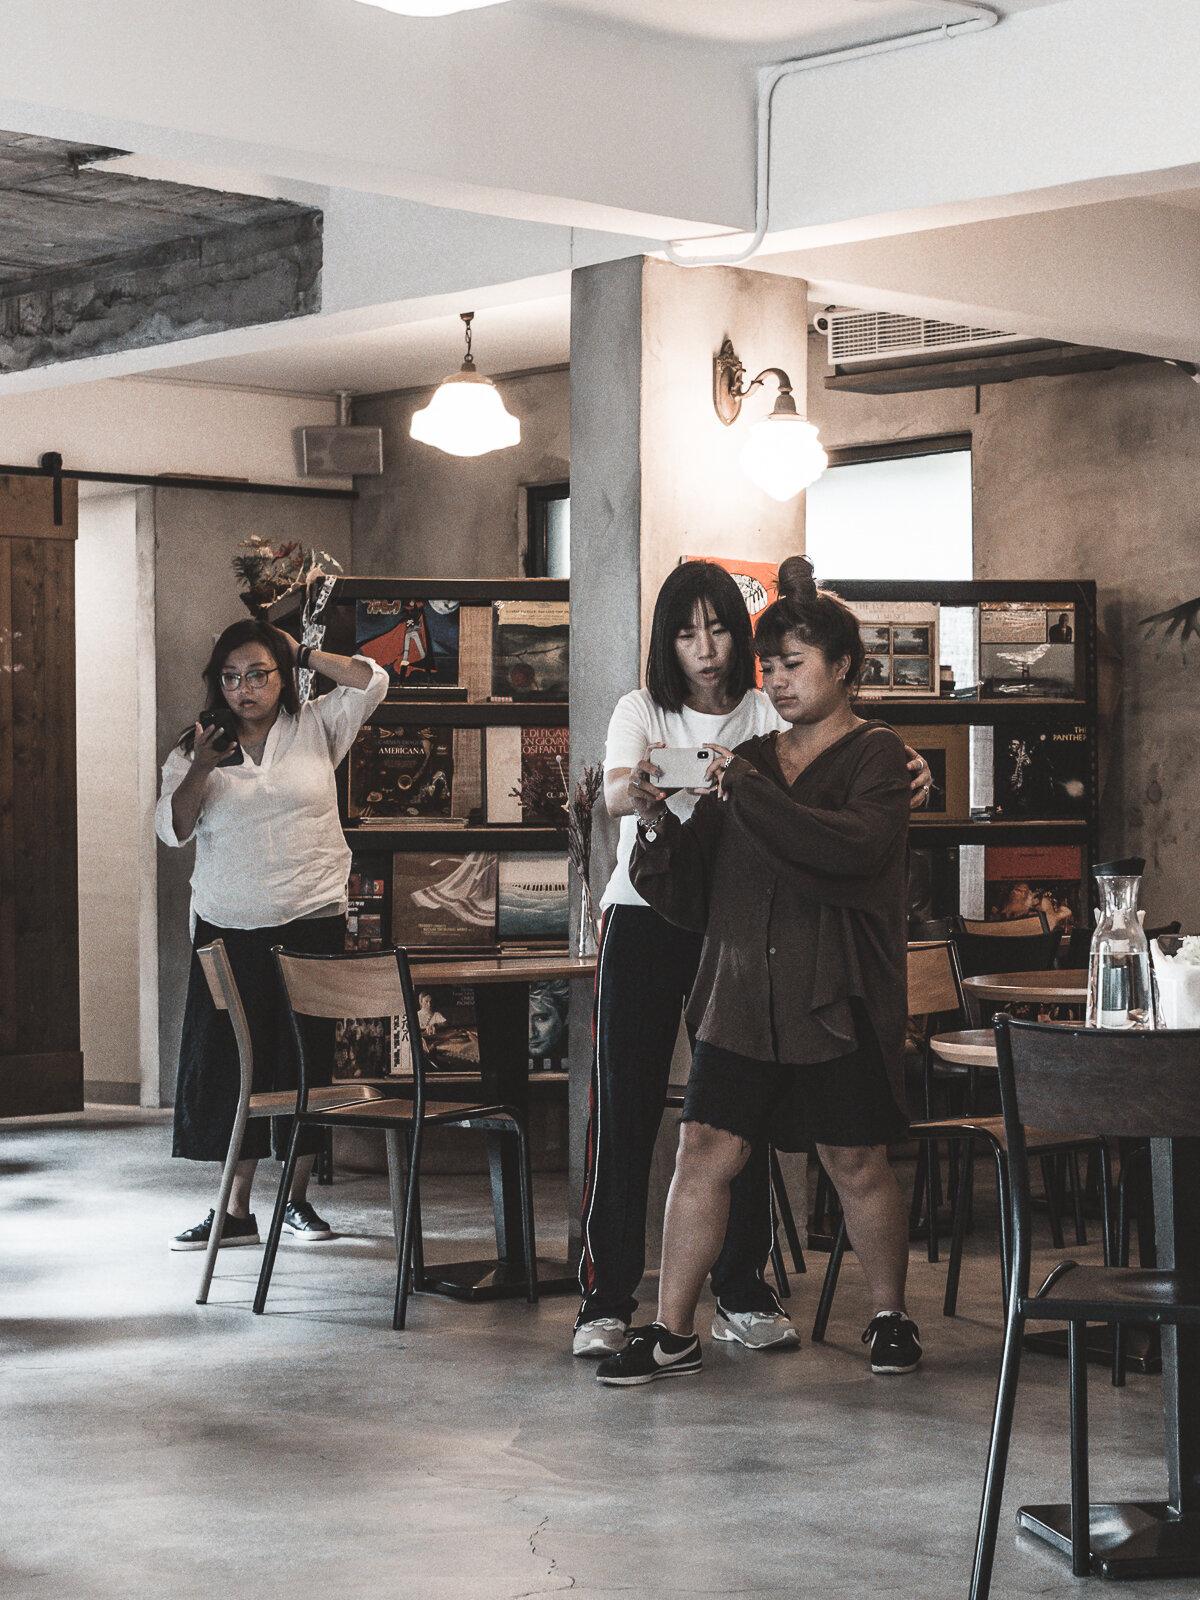 Charming Chat Photography Workshop - Olympus EM1 Markii 2512 - Yes! Please Enjoy by Fanning Tseng-16.jpg